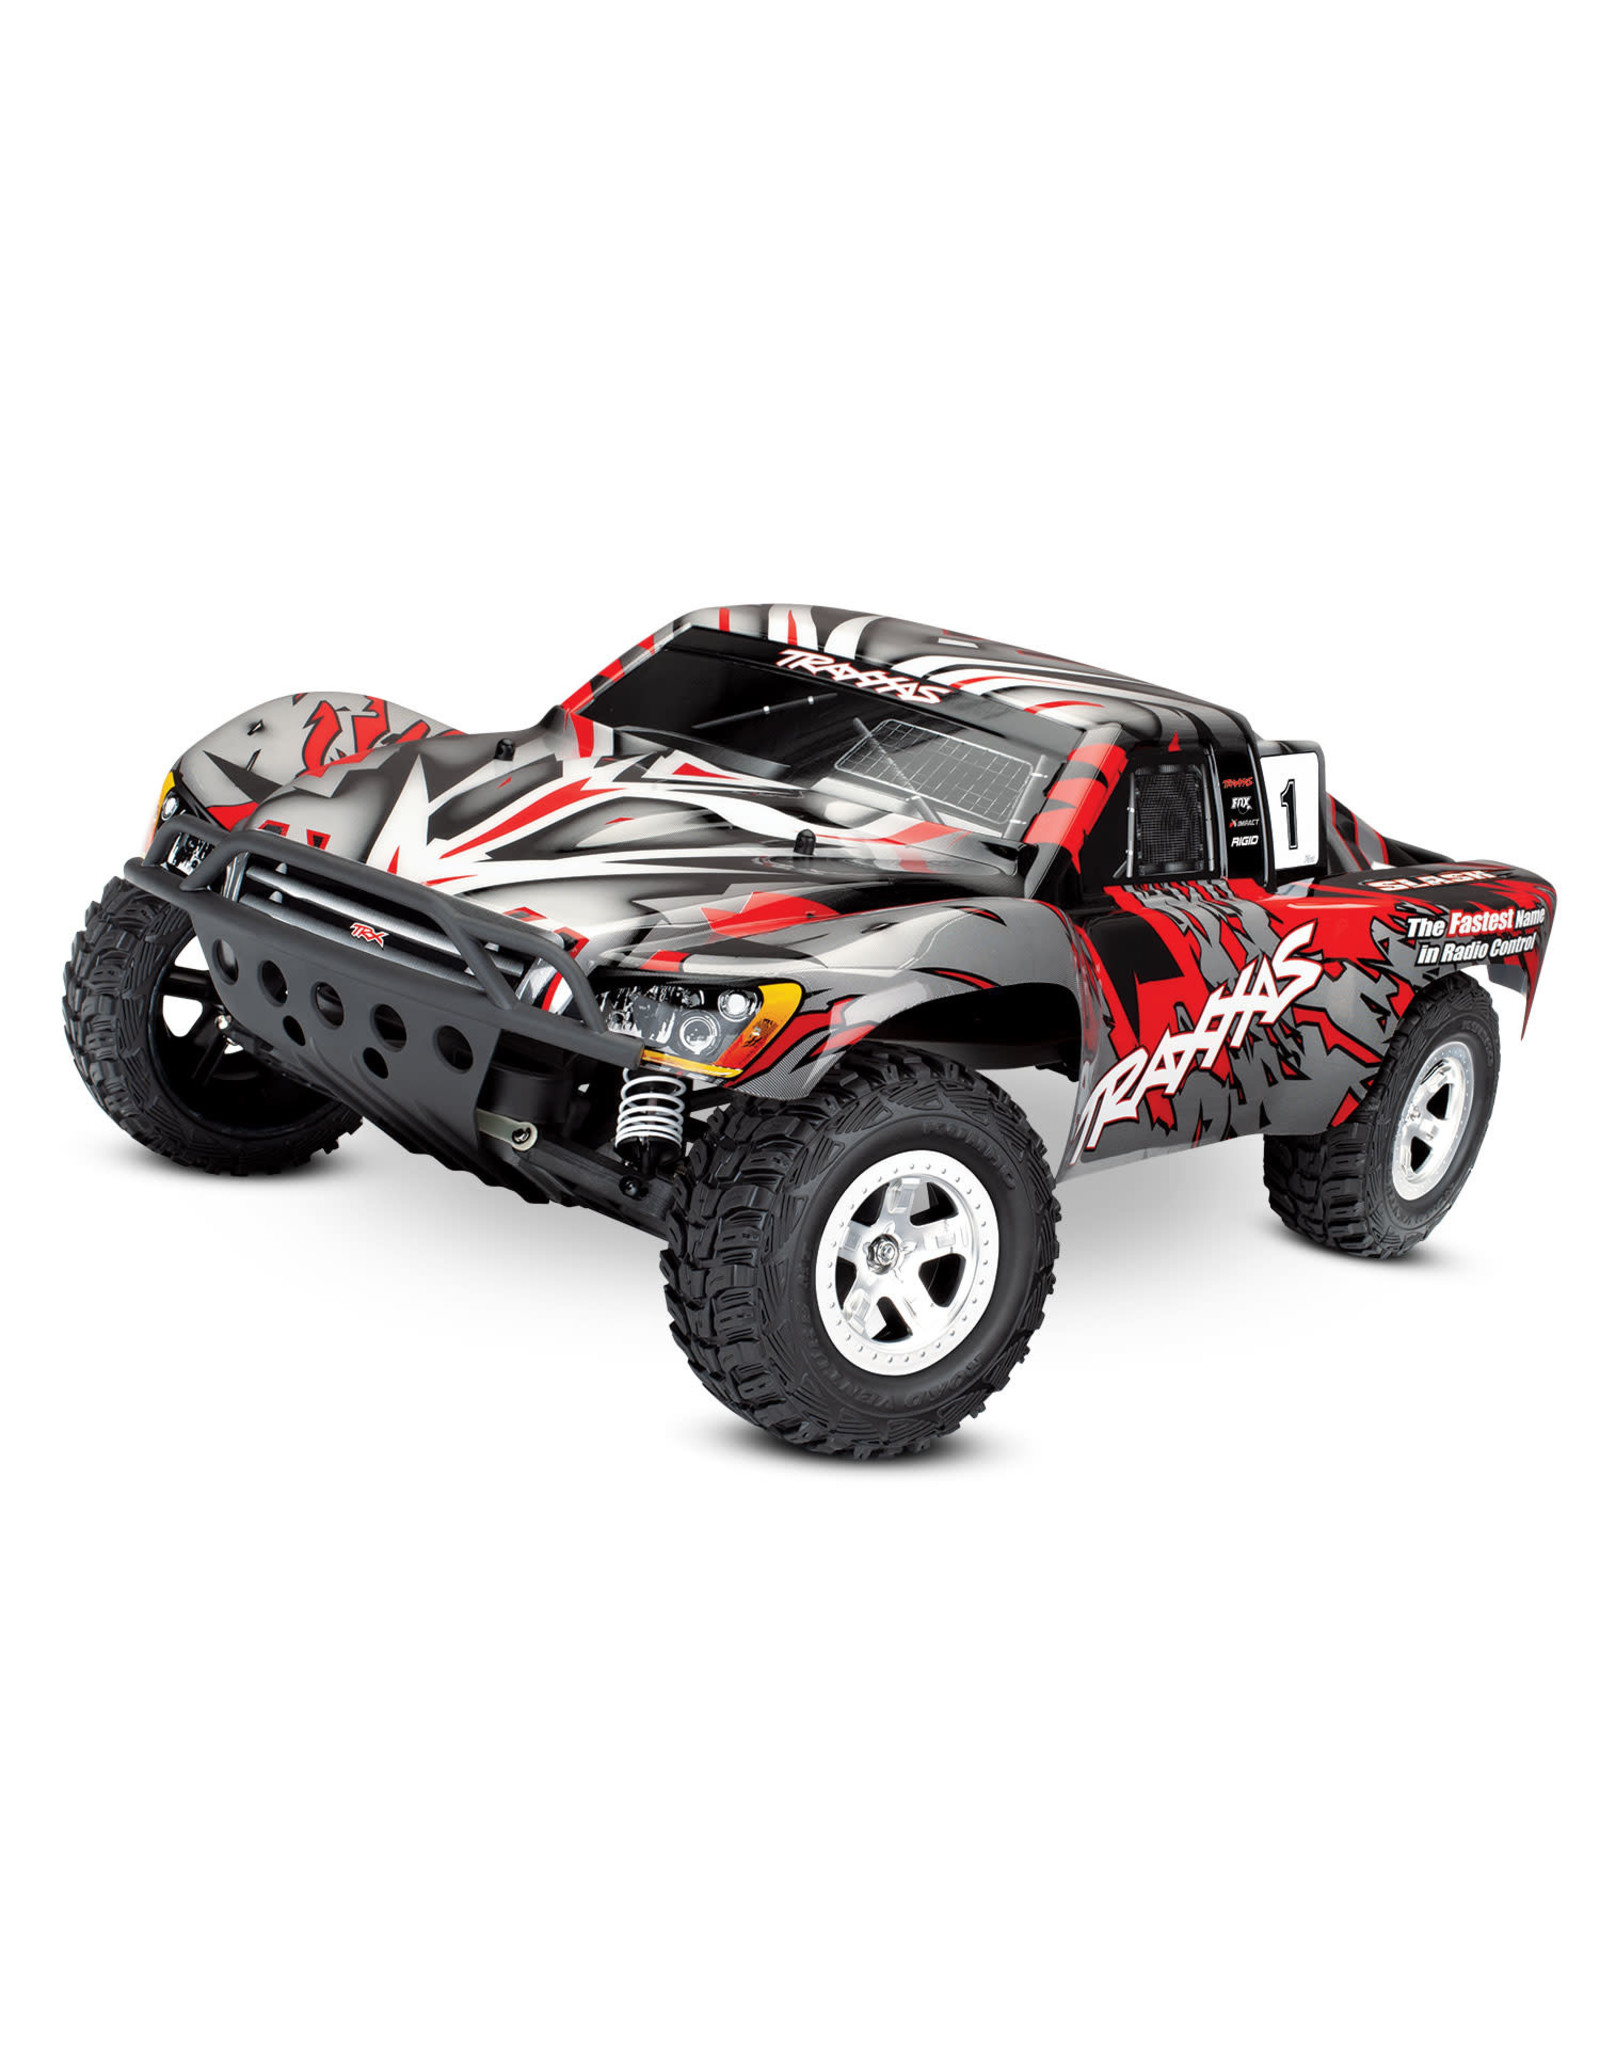 Traxxas Slash 1/10 2WD Red, Xl-5 RTR w/2.4GHz Radio - No Battery or